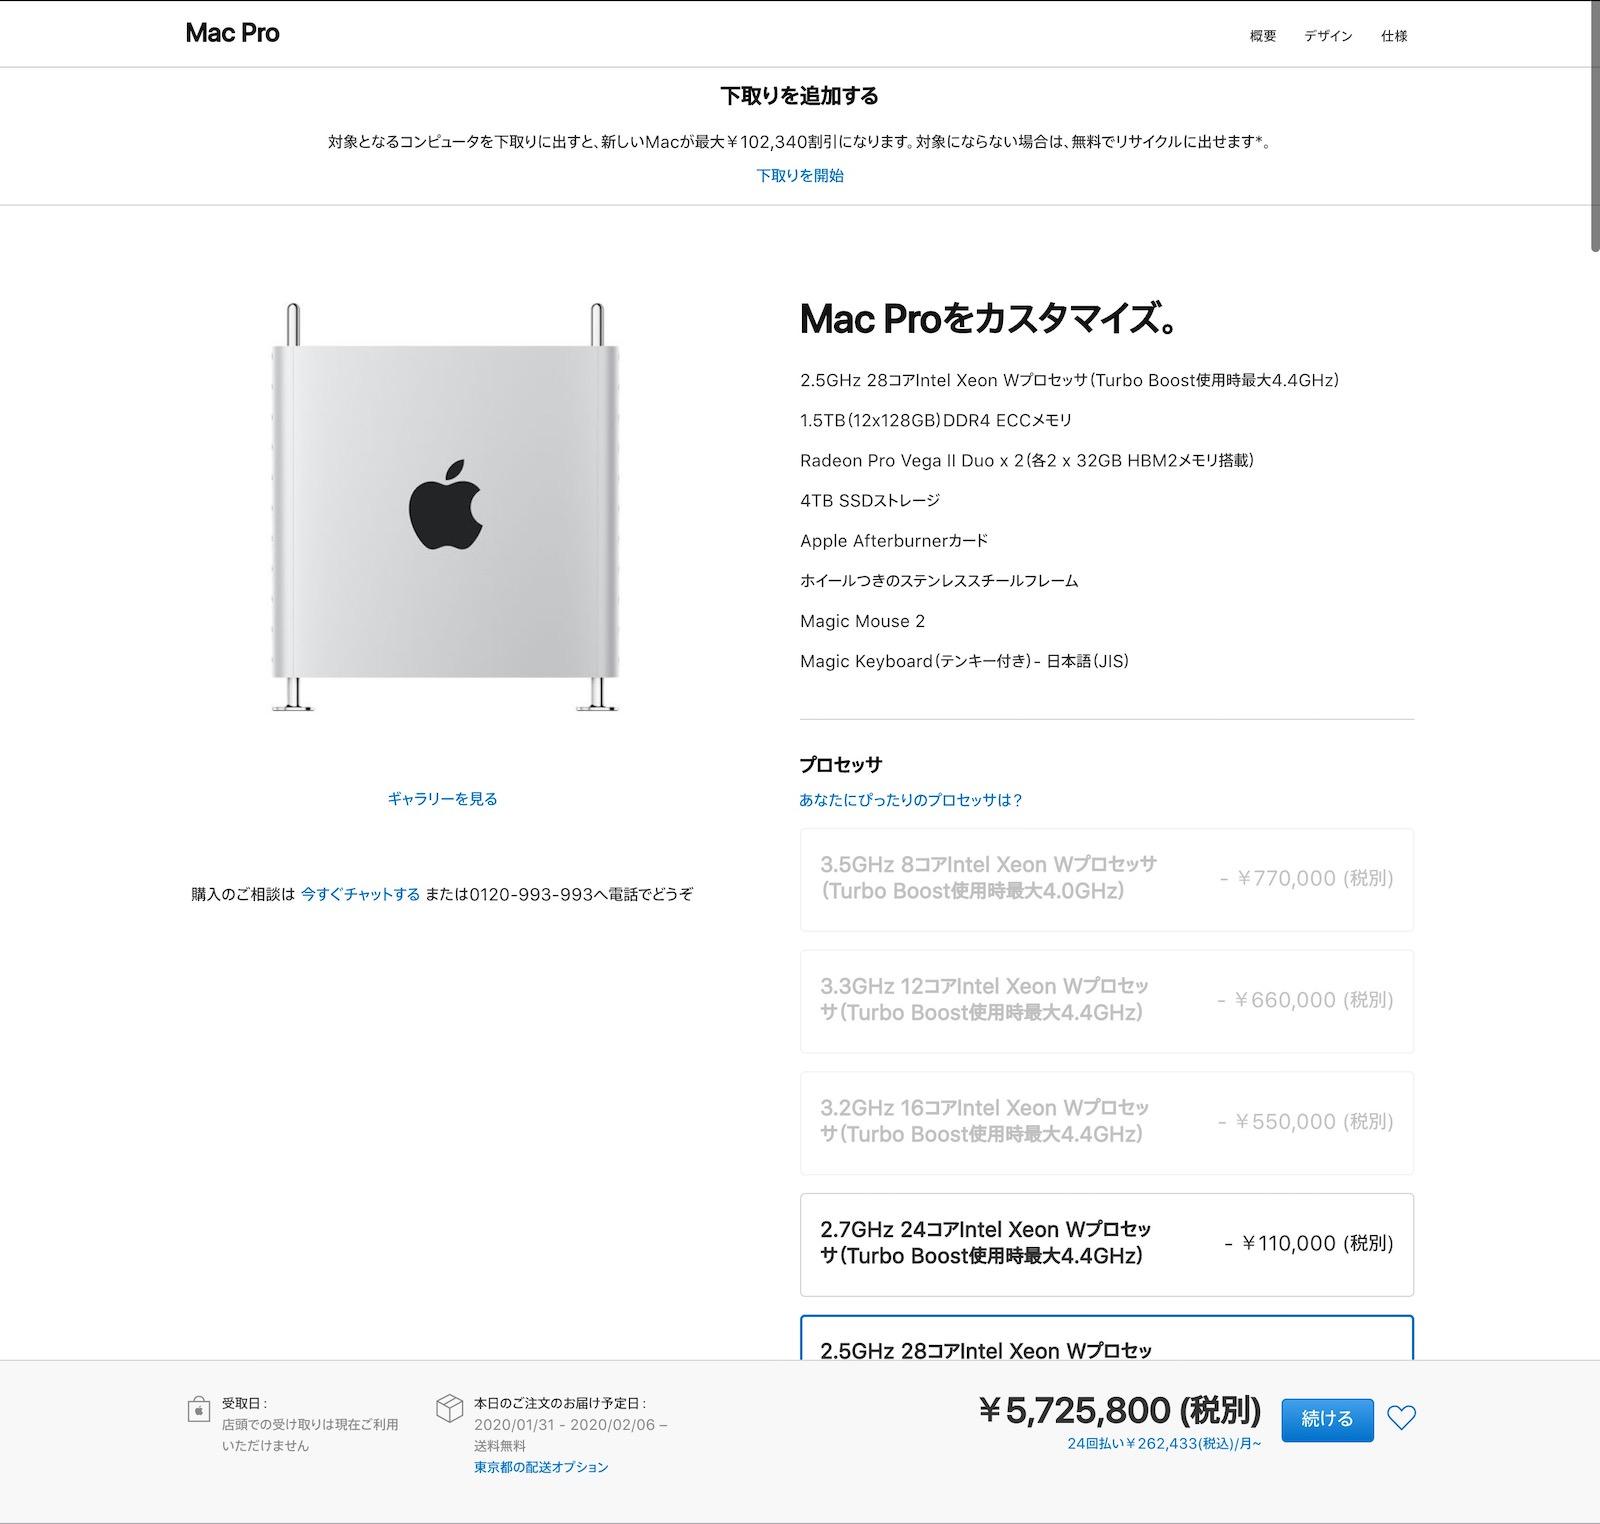 mac-pro-2019-full-spec.jpg